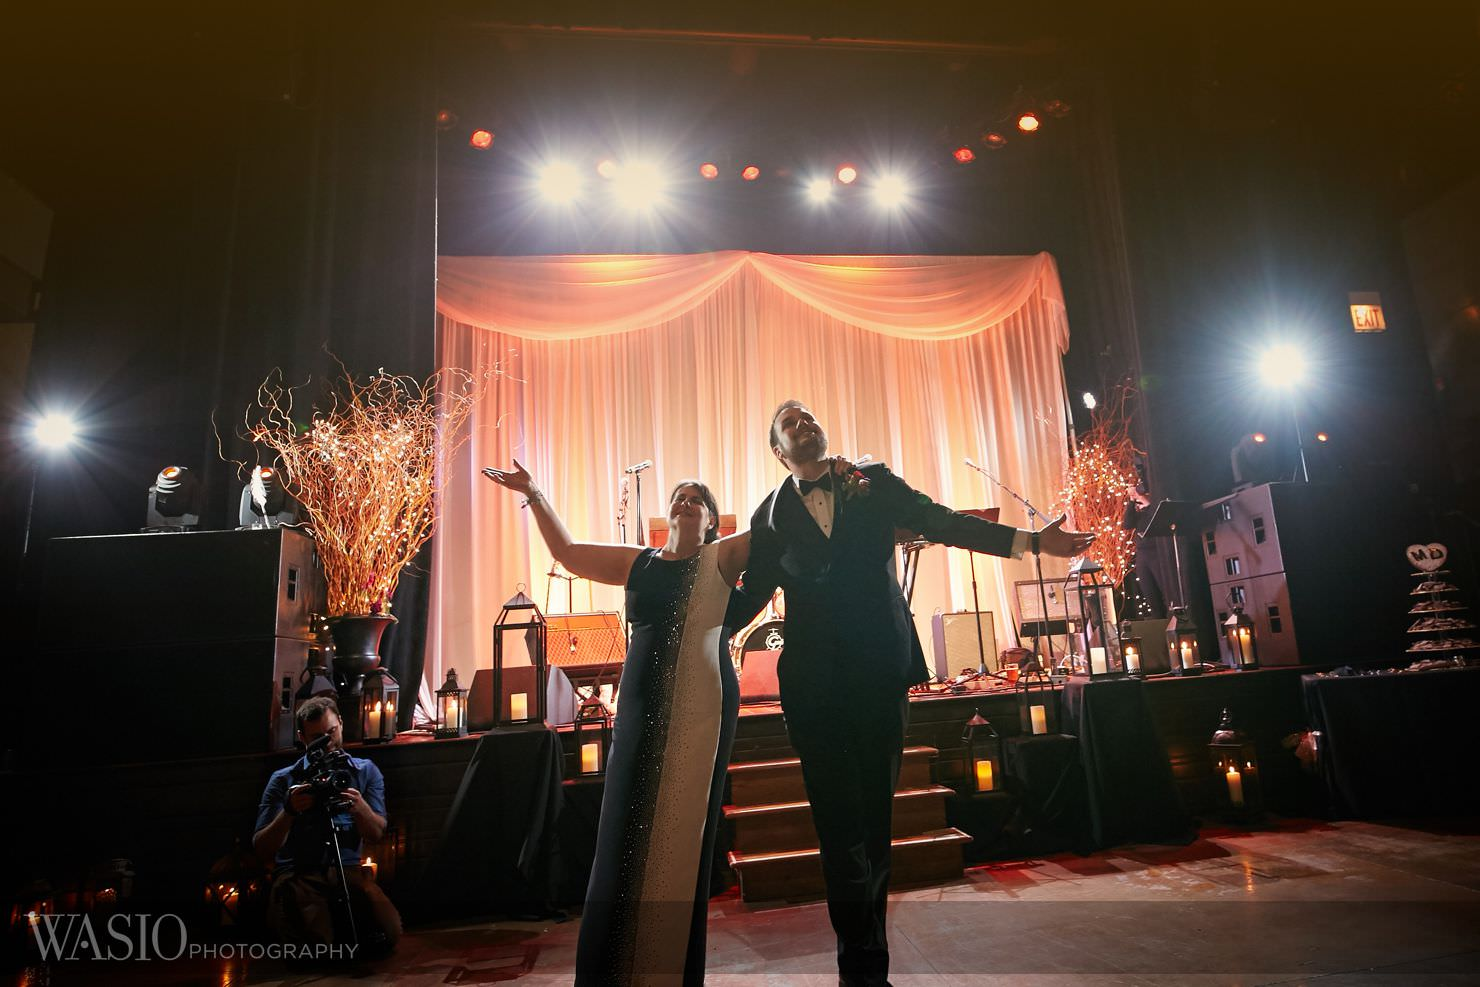 035_Lincoln-Park-Wedding_Dimphy-Mark__O3A0313 Lincoln Park Wedding - Dimphy & Mark